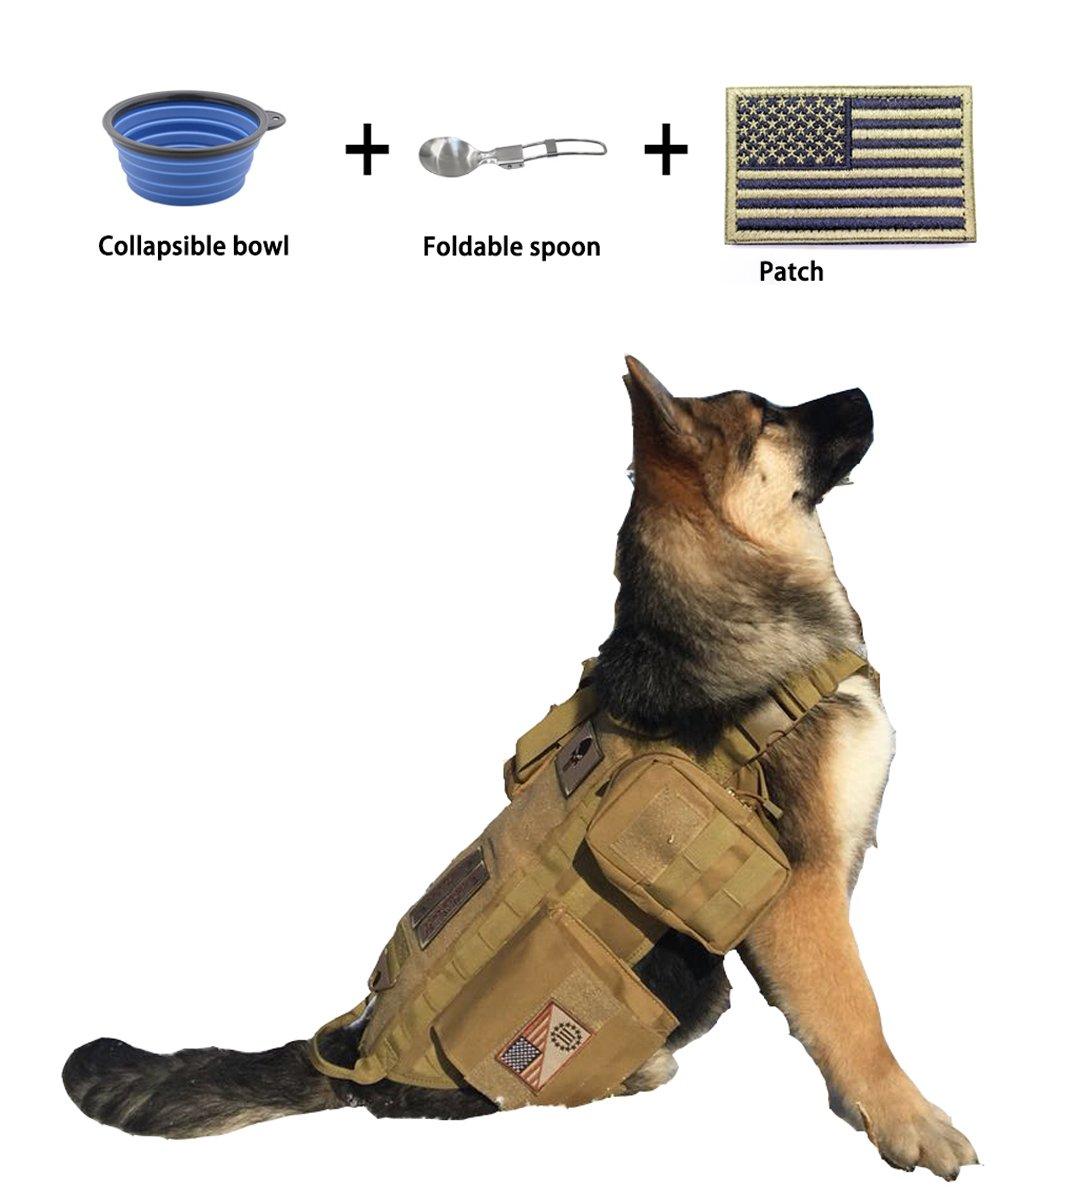 EJG Military Tactical Service Dog Training Vest Molle Dog Harness Camping Hiking Traveling Nylon Adjustable Coat with 3 Detachable Pouches for Medium & Large Dog EJG®